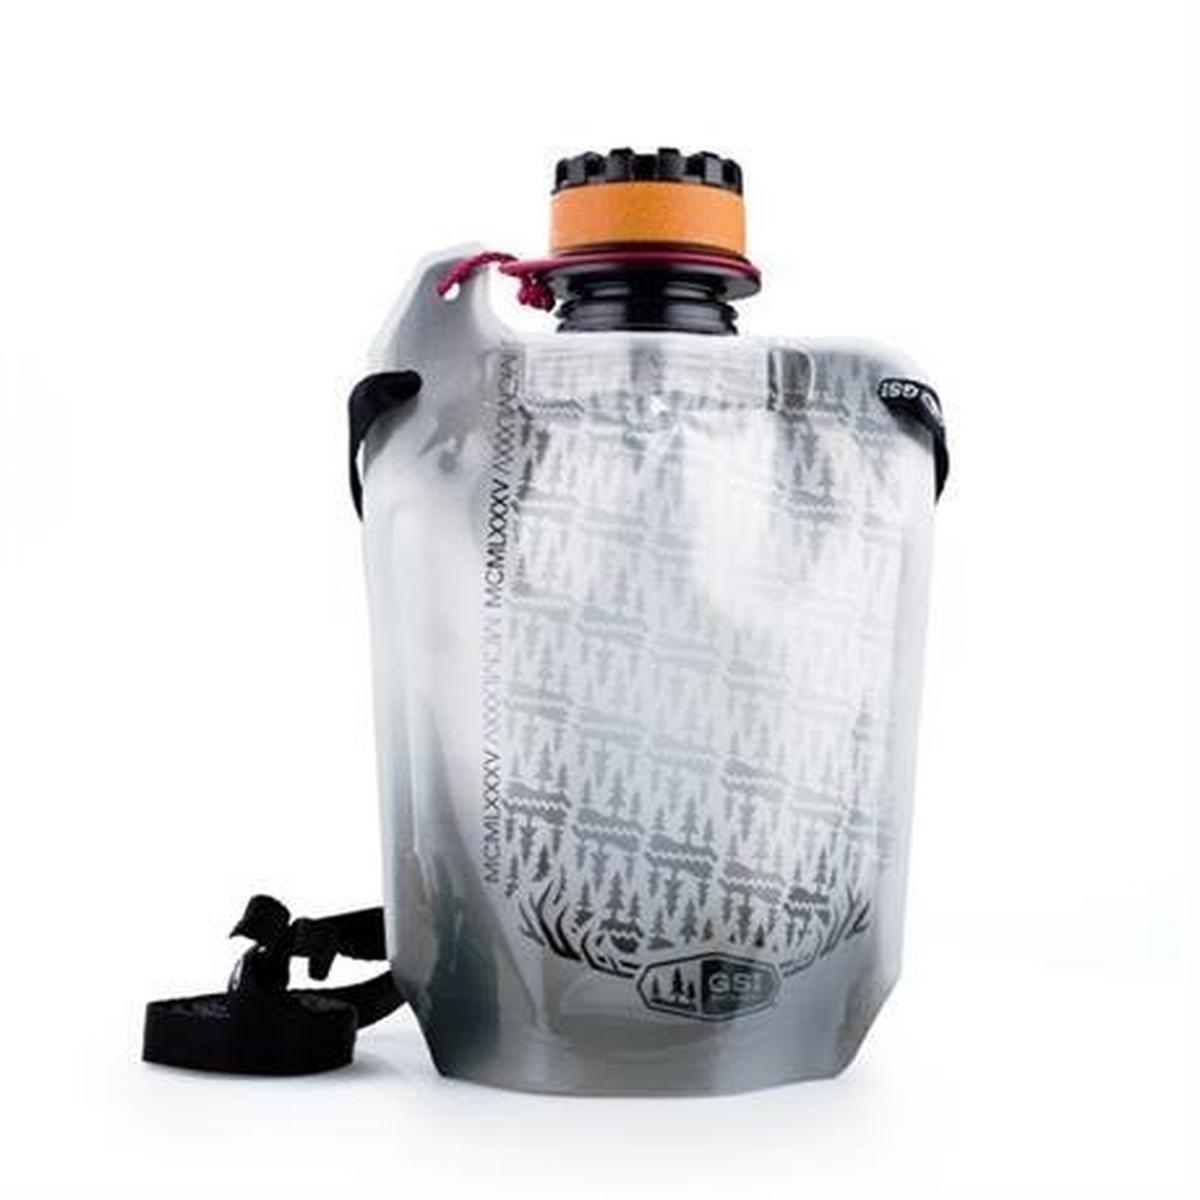 Gsi Outdoors GSI Highland Flask 9 fl oz